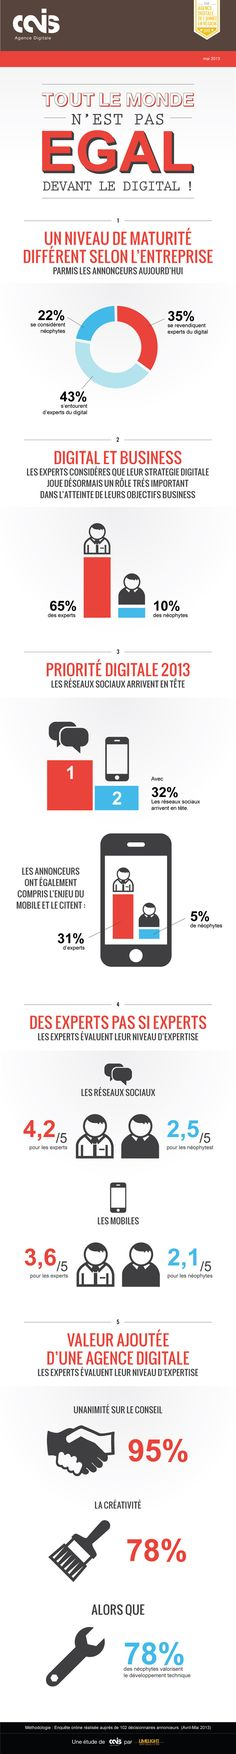 Infographie : 35% des annonceurs se considèrent comme experts du digital Digital Web, Digital Trends, Digital Media, Social Networks, Social Media, Interactive Marketing, Social Business, Digital Strategy, Big Data